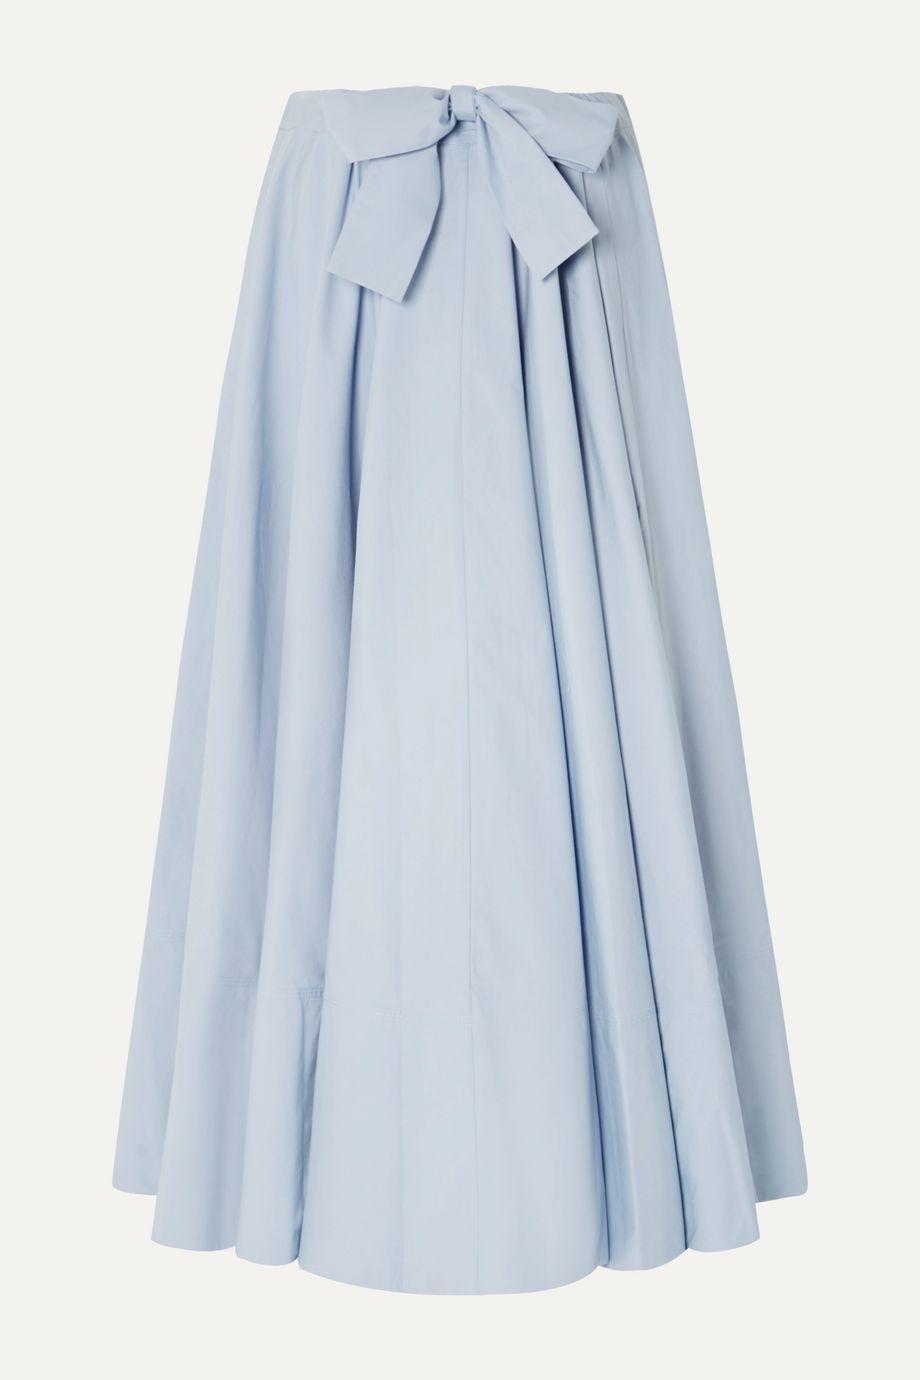 Co Cotton-poplin maxi skirt